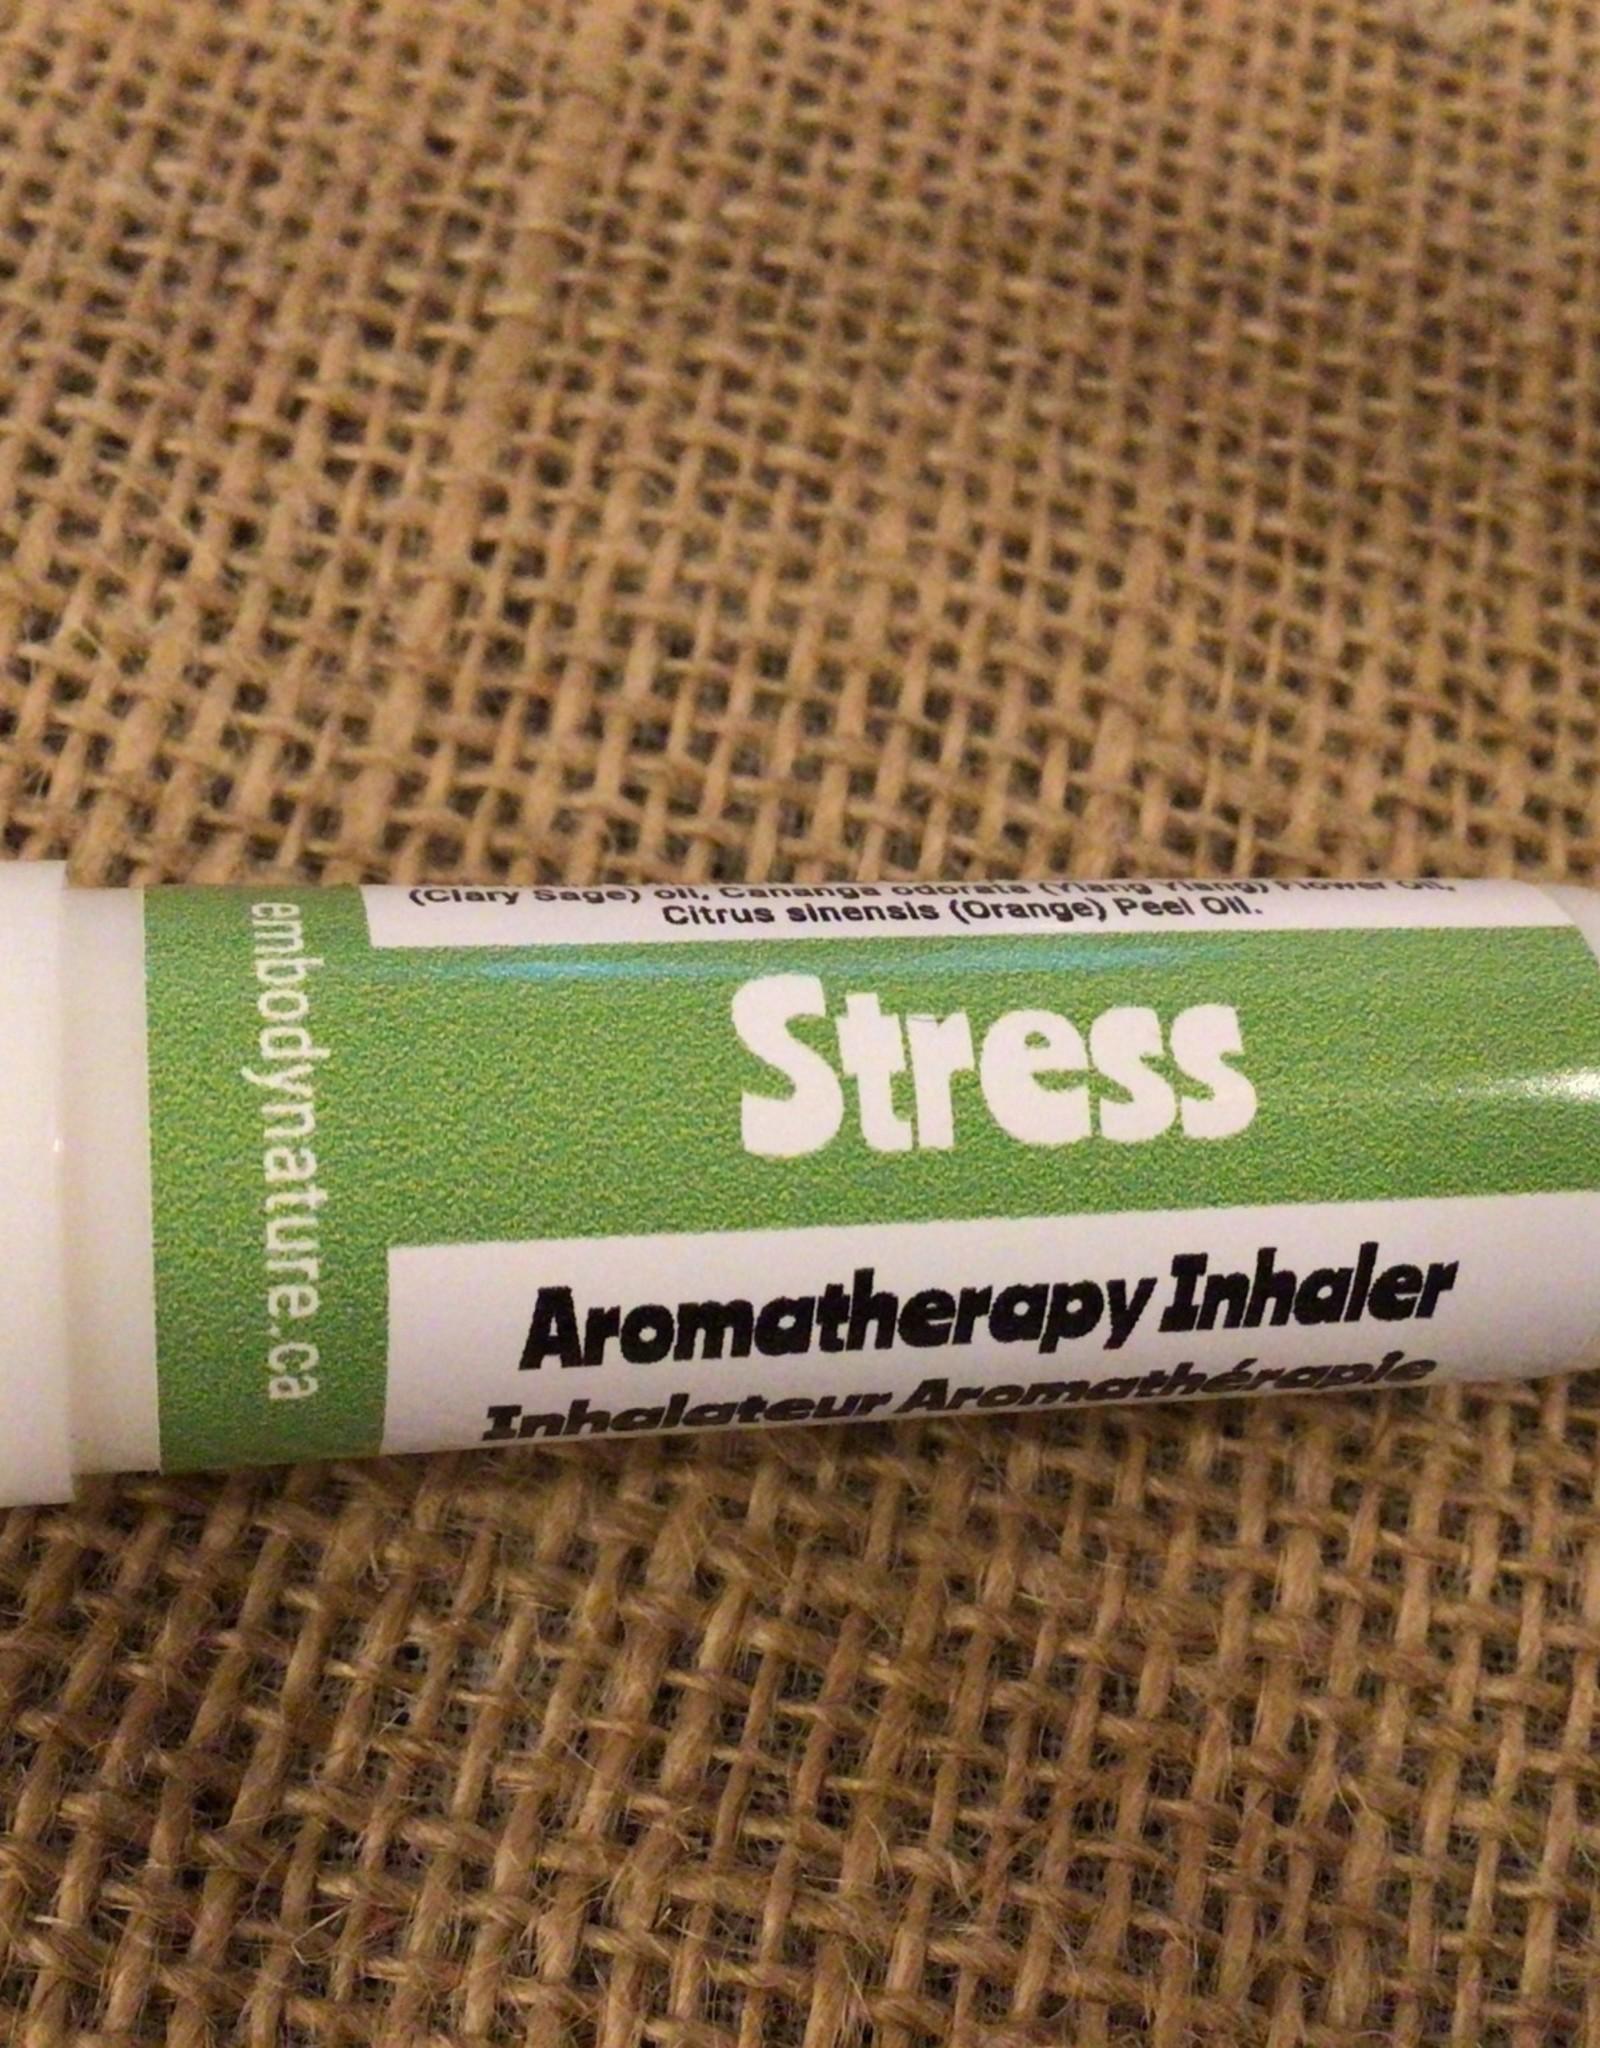 Embody Nature Stress Aromatherapy Inhaler